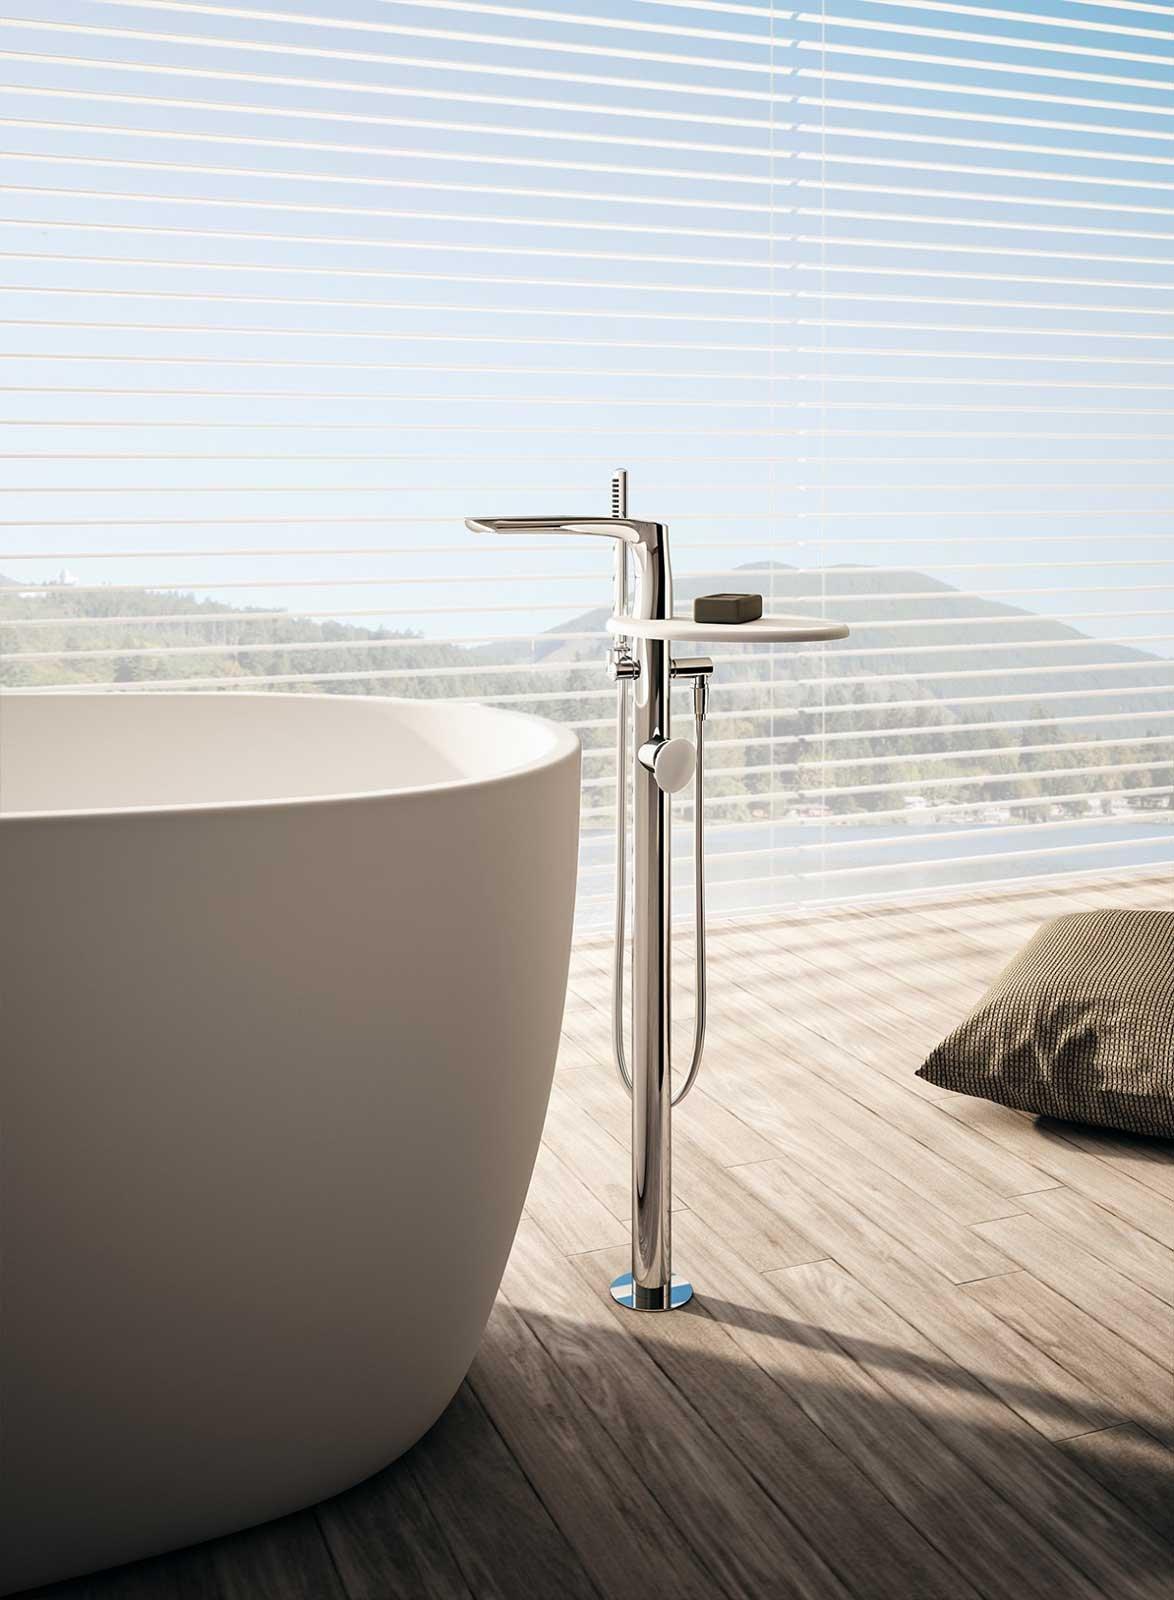 rubinetteria di design synergy di fir italia cose di casa. Black Bedroom Furniture Sets. Home Design Ideas